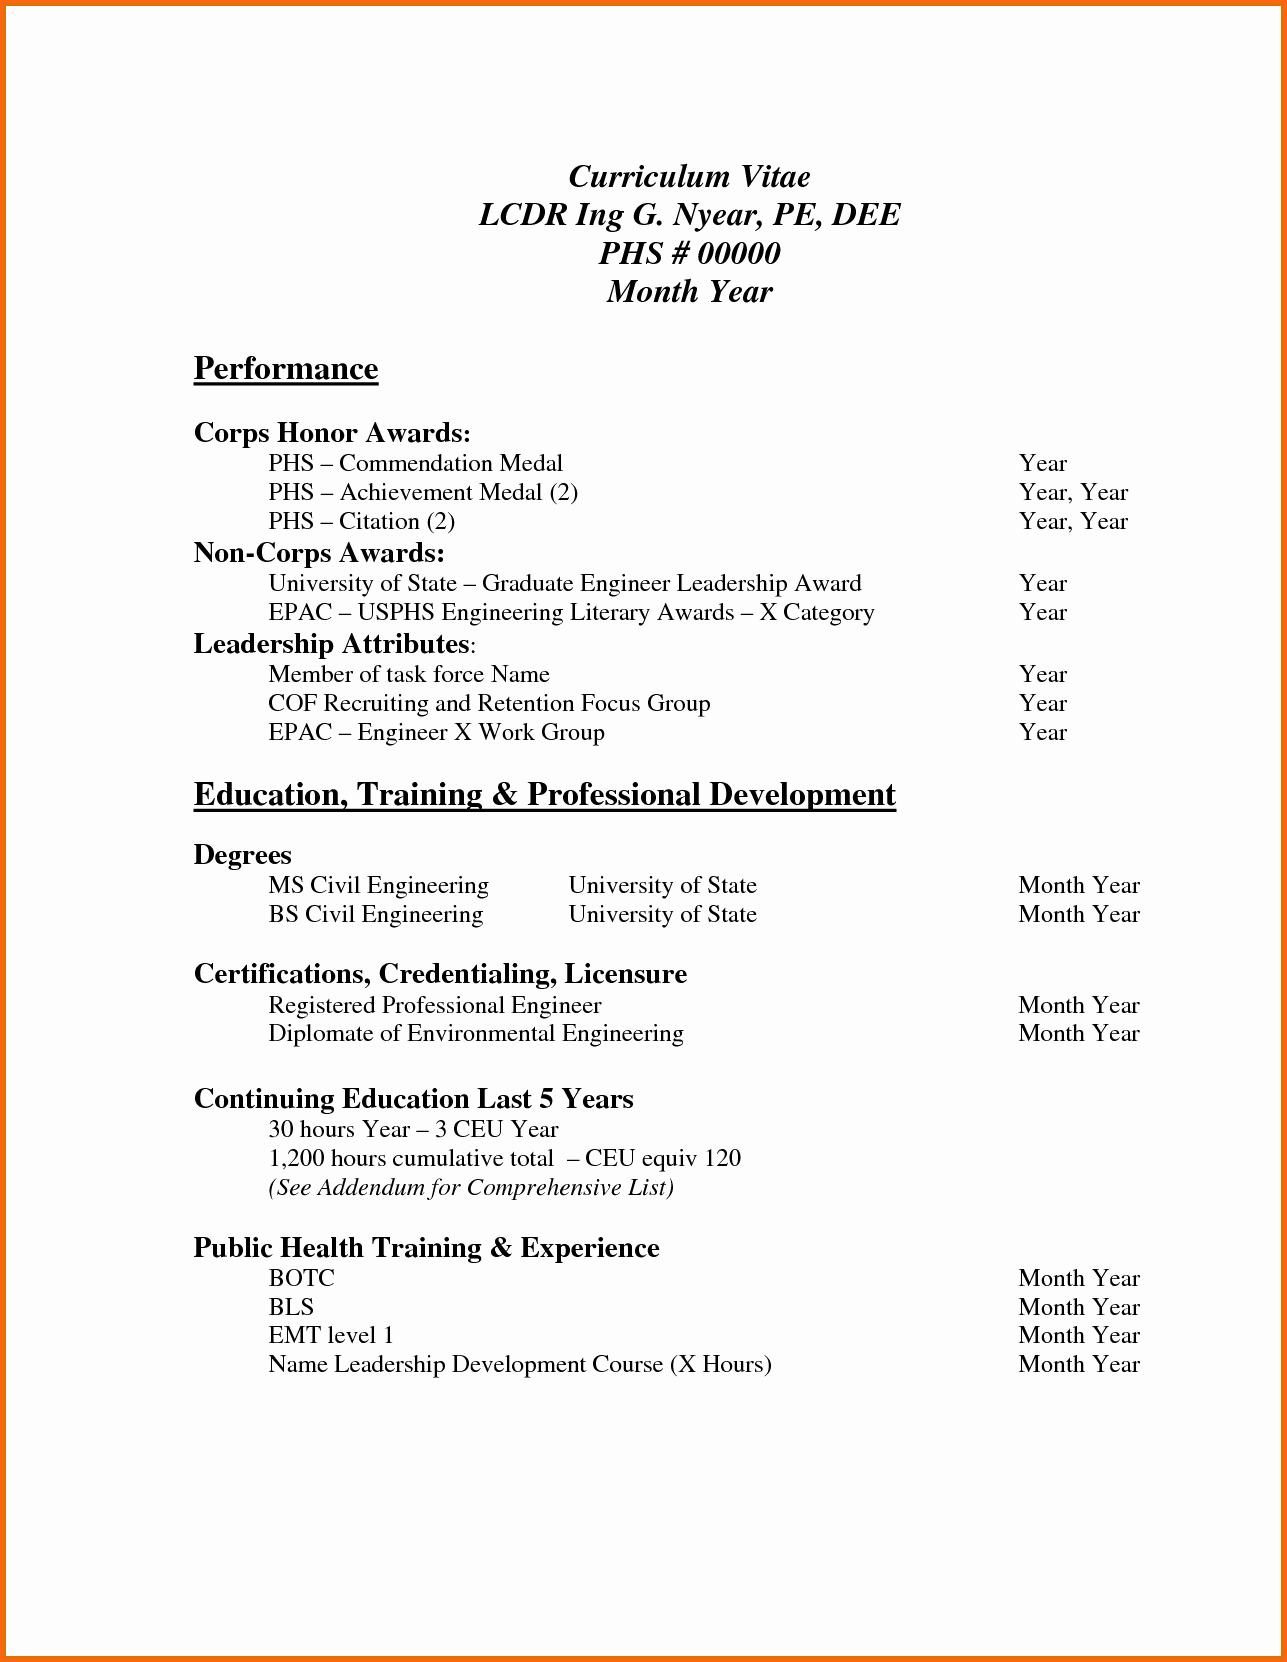 Sample Of Curriculum Vitae format Beautiful 6 Professional Curriculum Vitae format Sample Bud